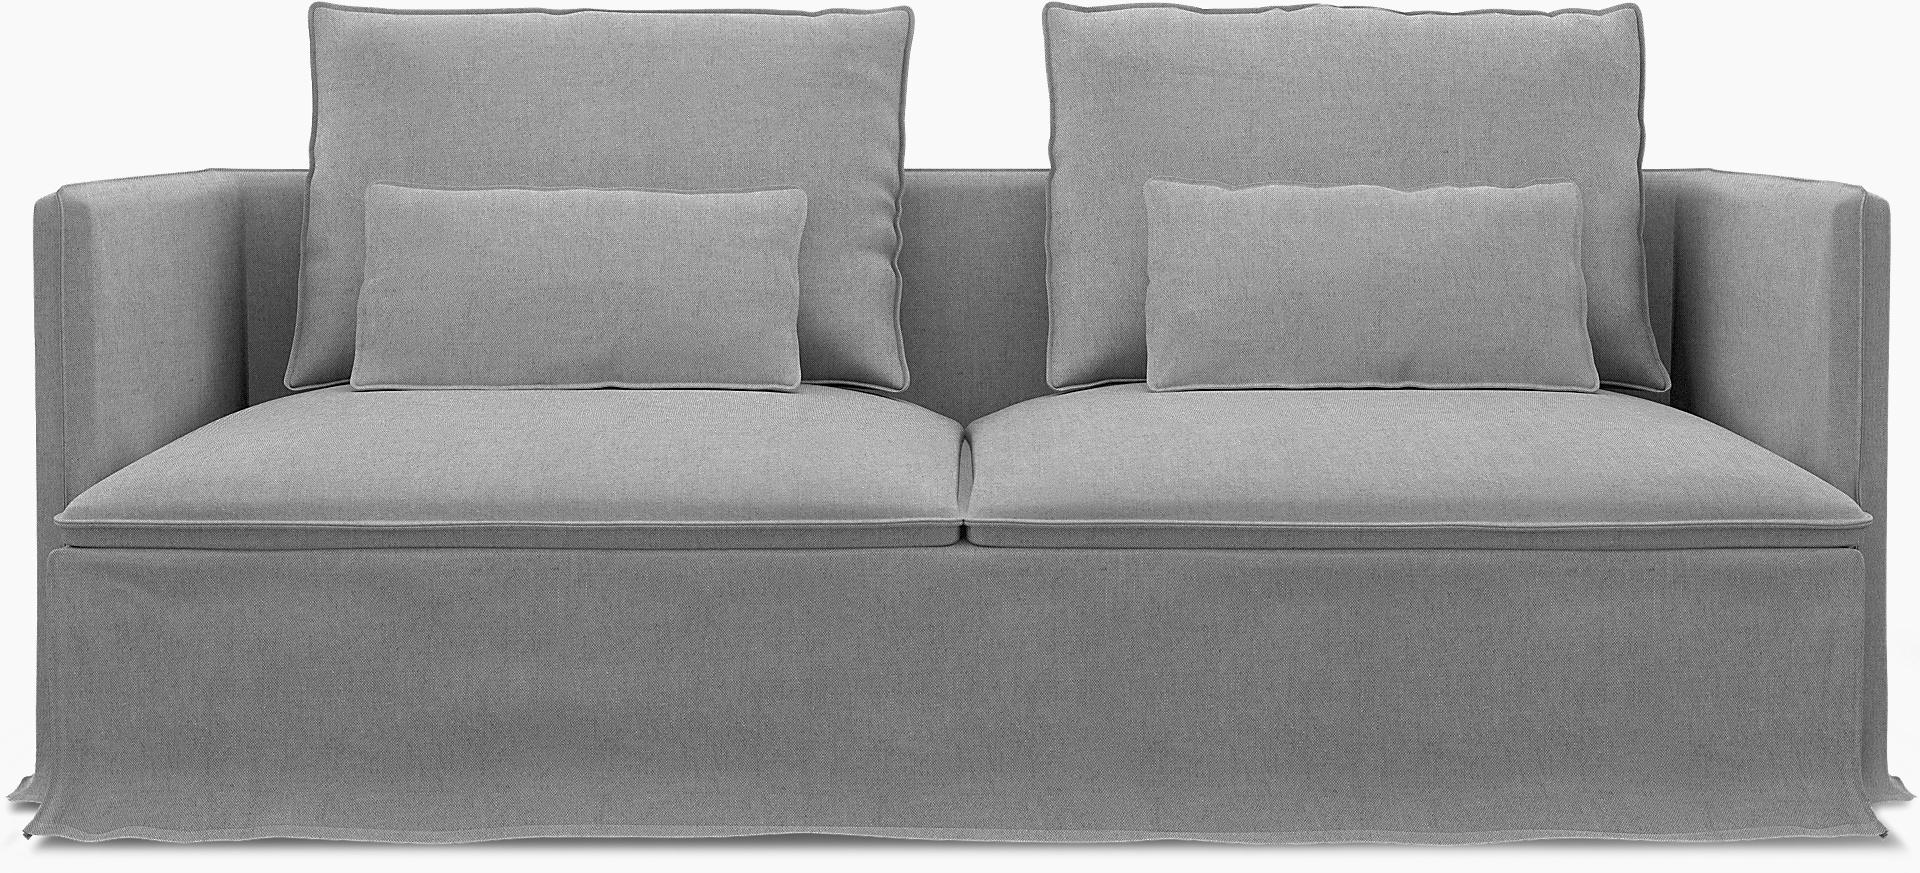 Swell Ikea Soderhamn 3 Seater Sofa Cover Loose Fit Bemz Uwap Interior Chair Design Uwaporg